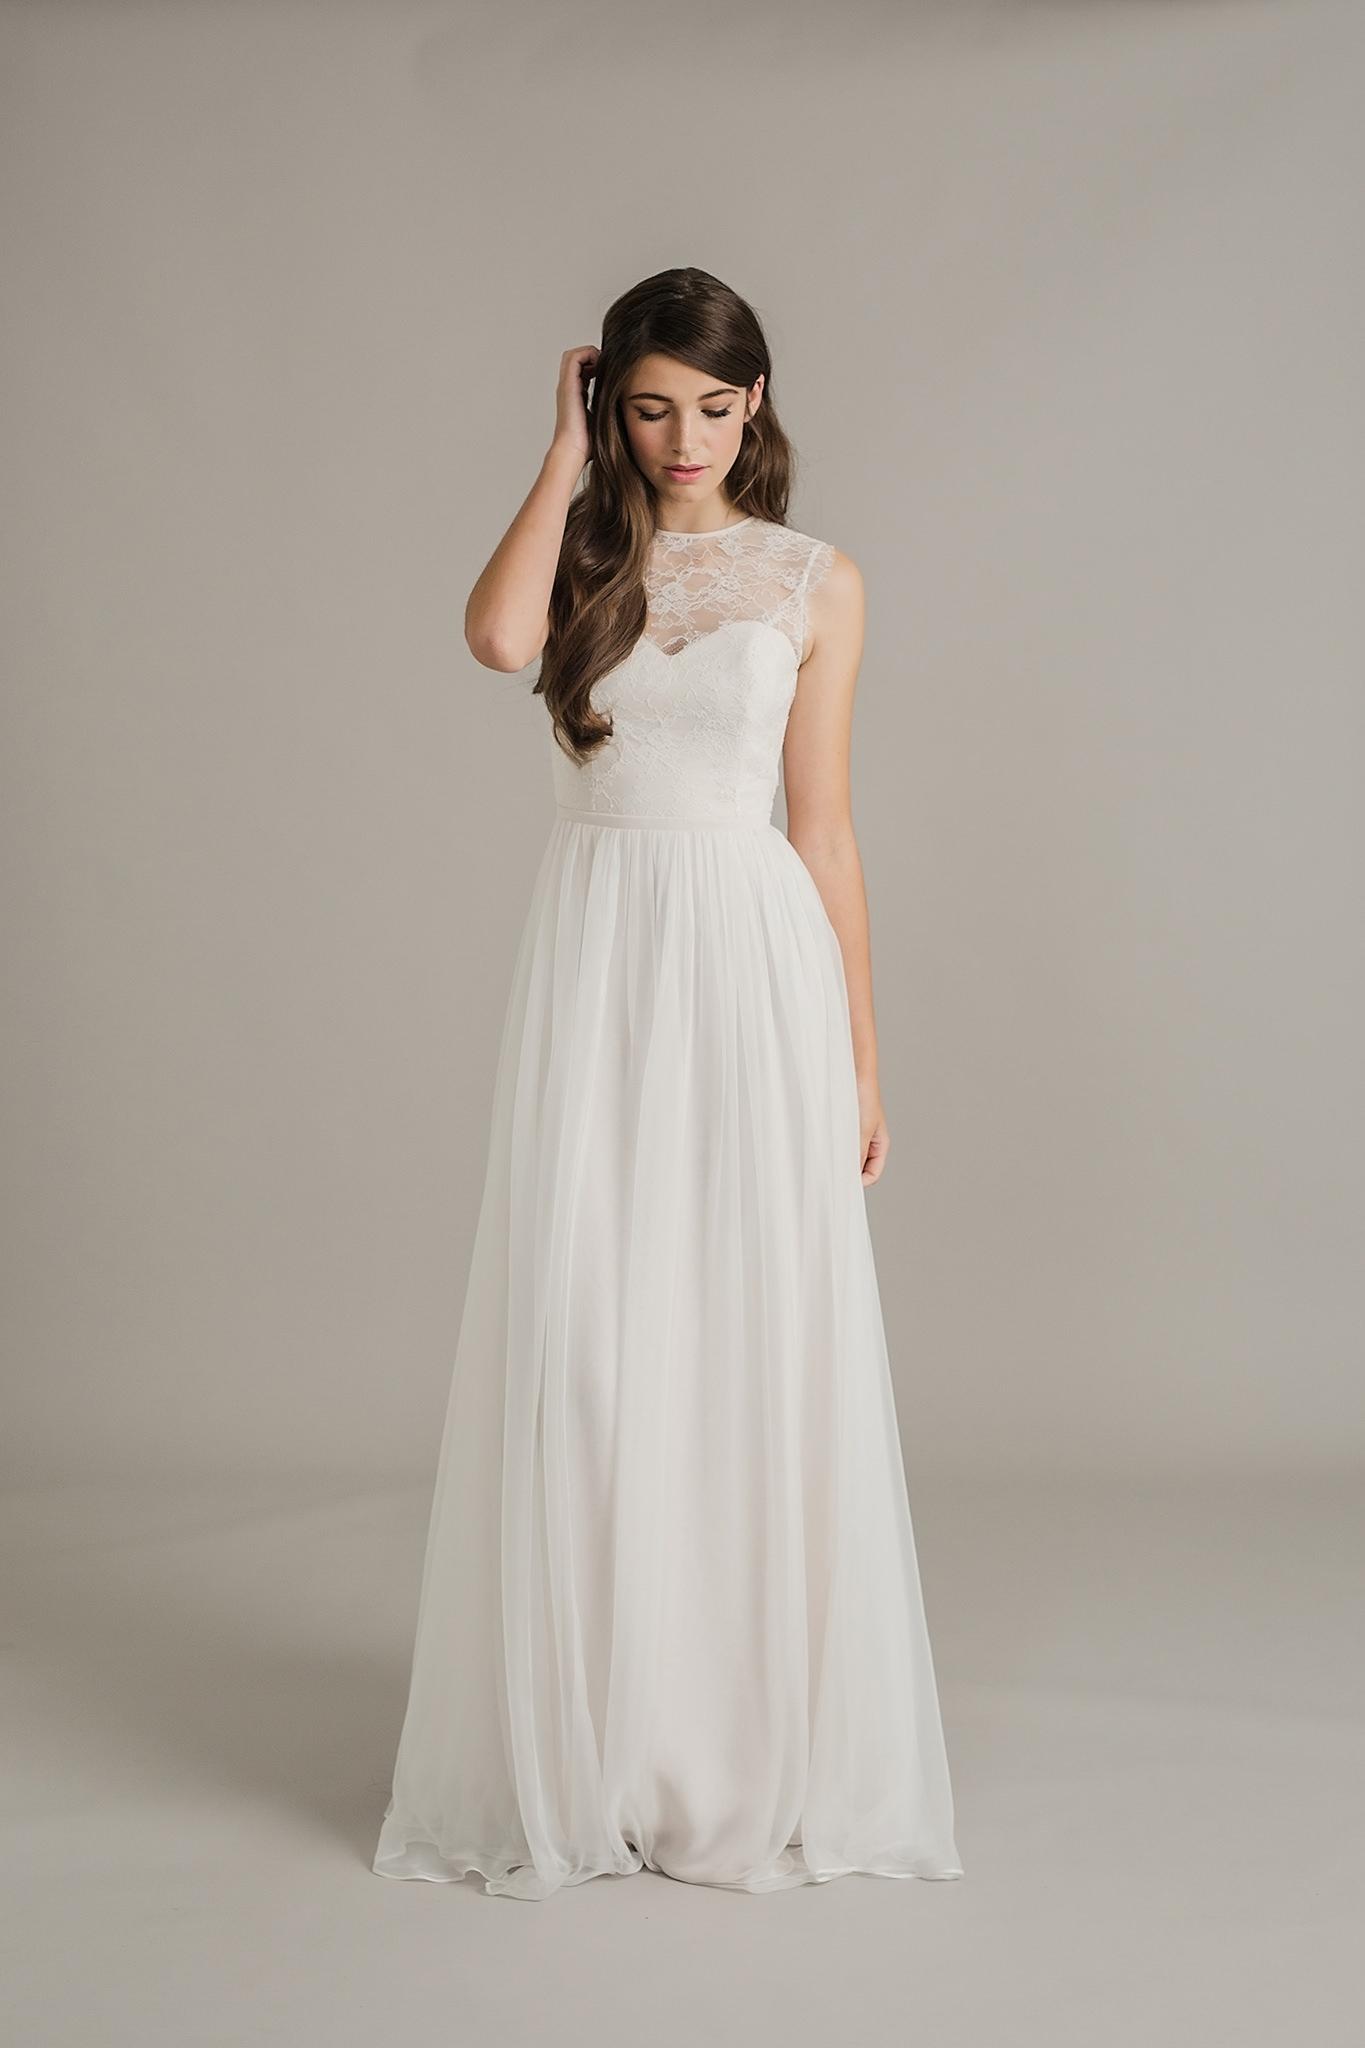 Paige wedding dress by Sally Eagle